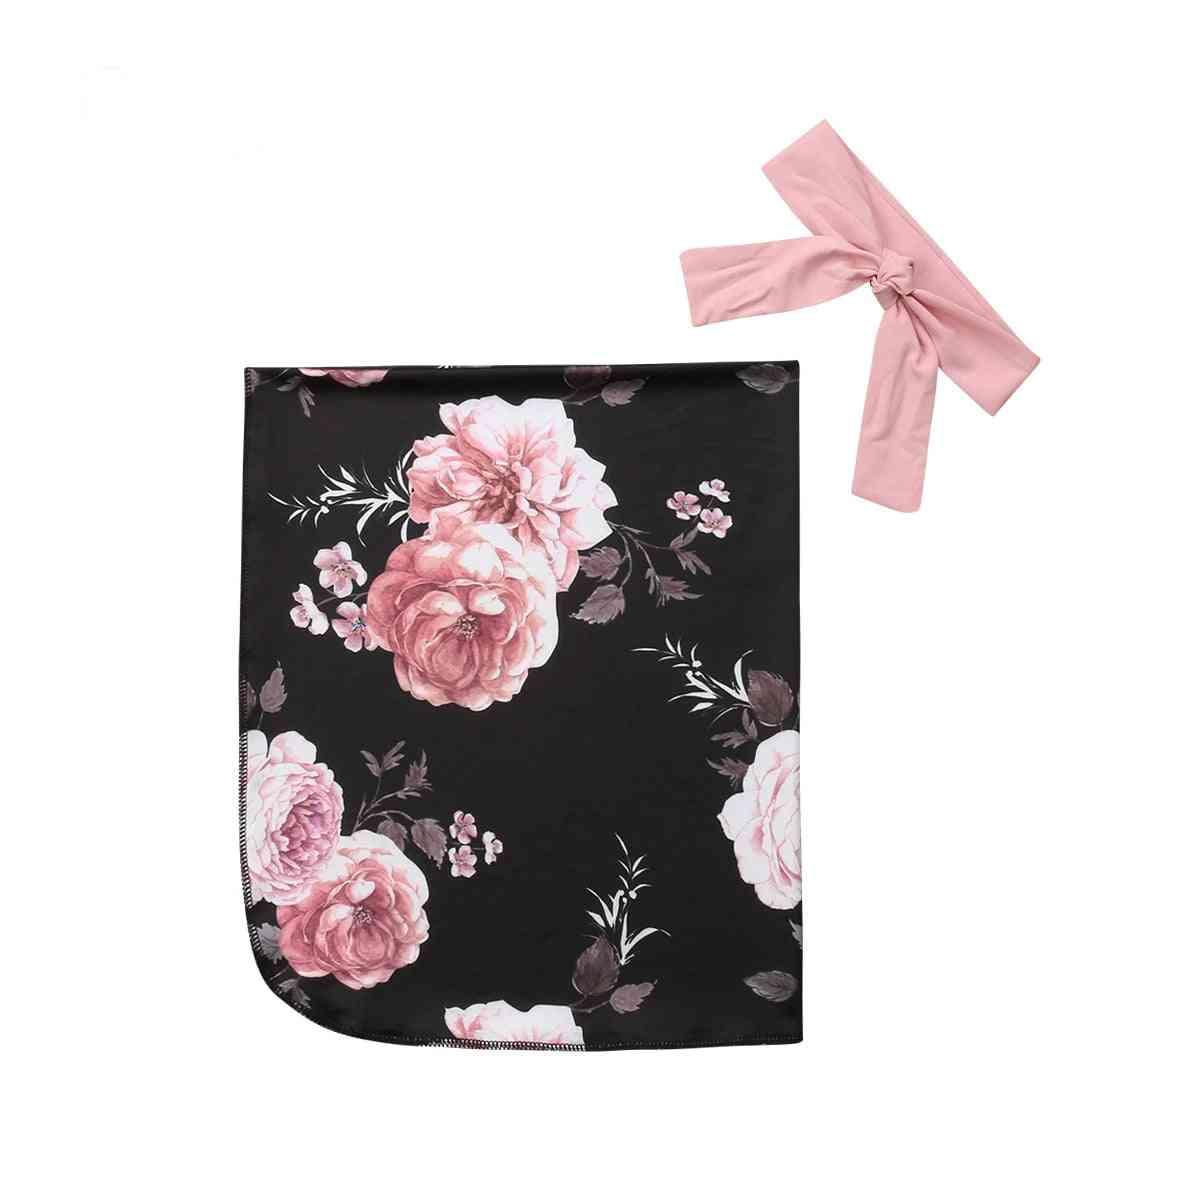 Newborn Baby Cotton Floral Print Blanket Swaddle Muslin Wrap Swaddling Sleeping Bag+headwear